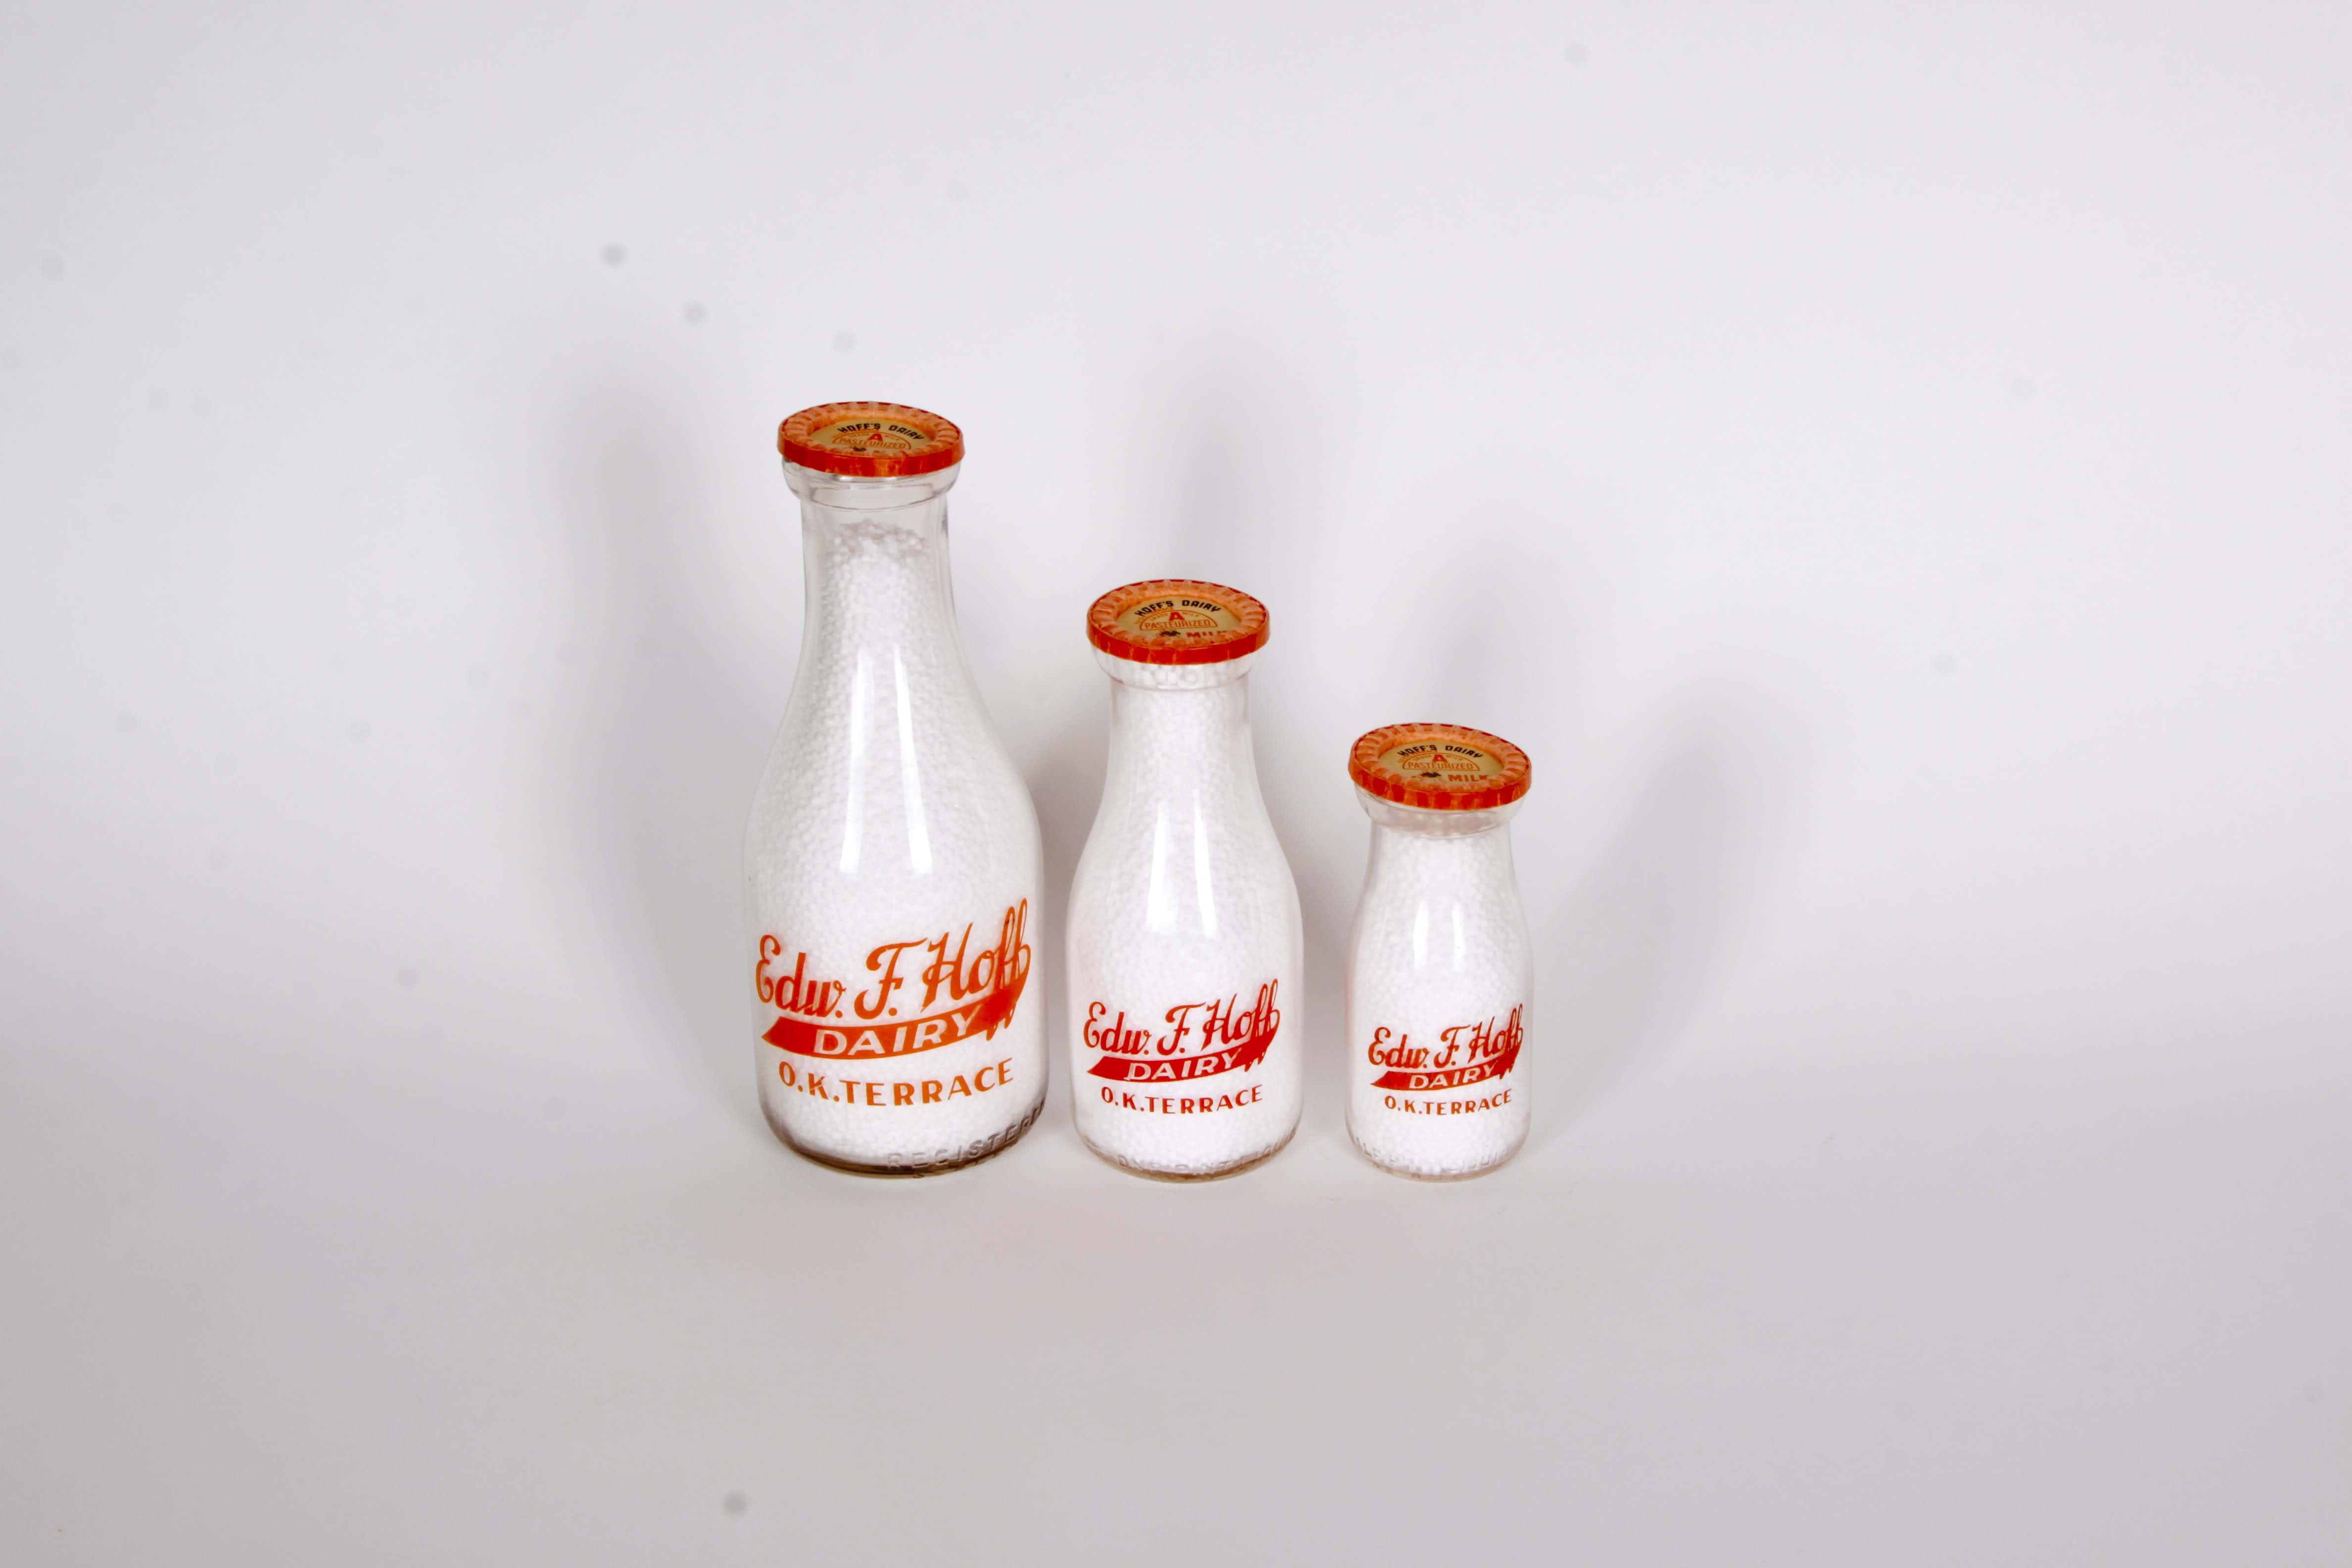 Edward F. Hoff Dairy Milk Bottle Set